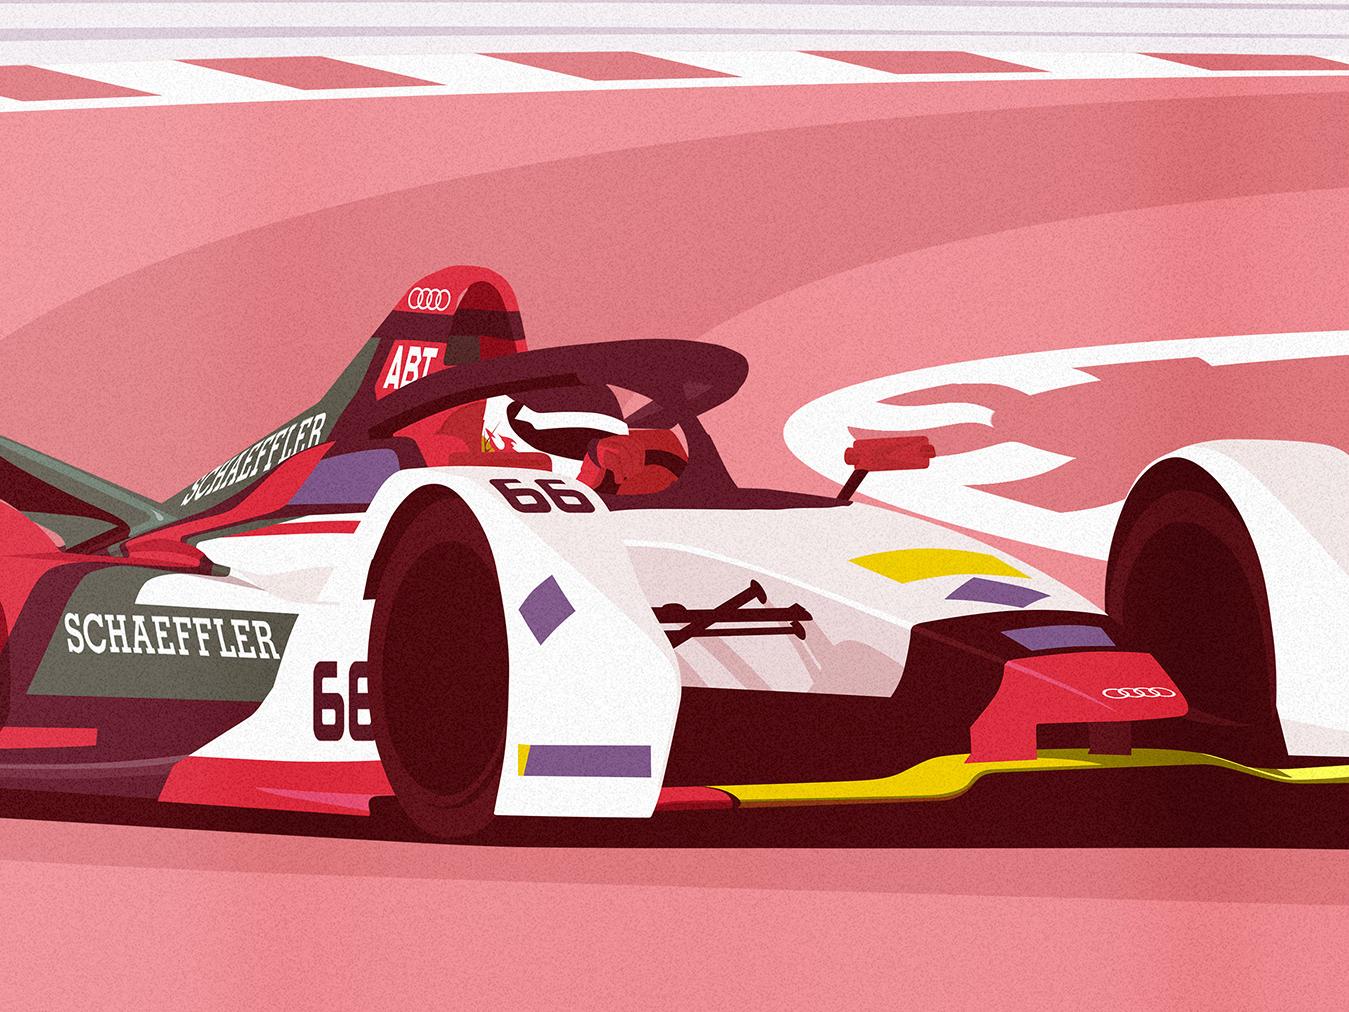 Marrakesh E-Prix audi marrakesh morocco vector motorsport formula e illustration racing